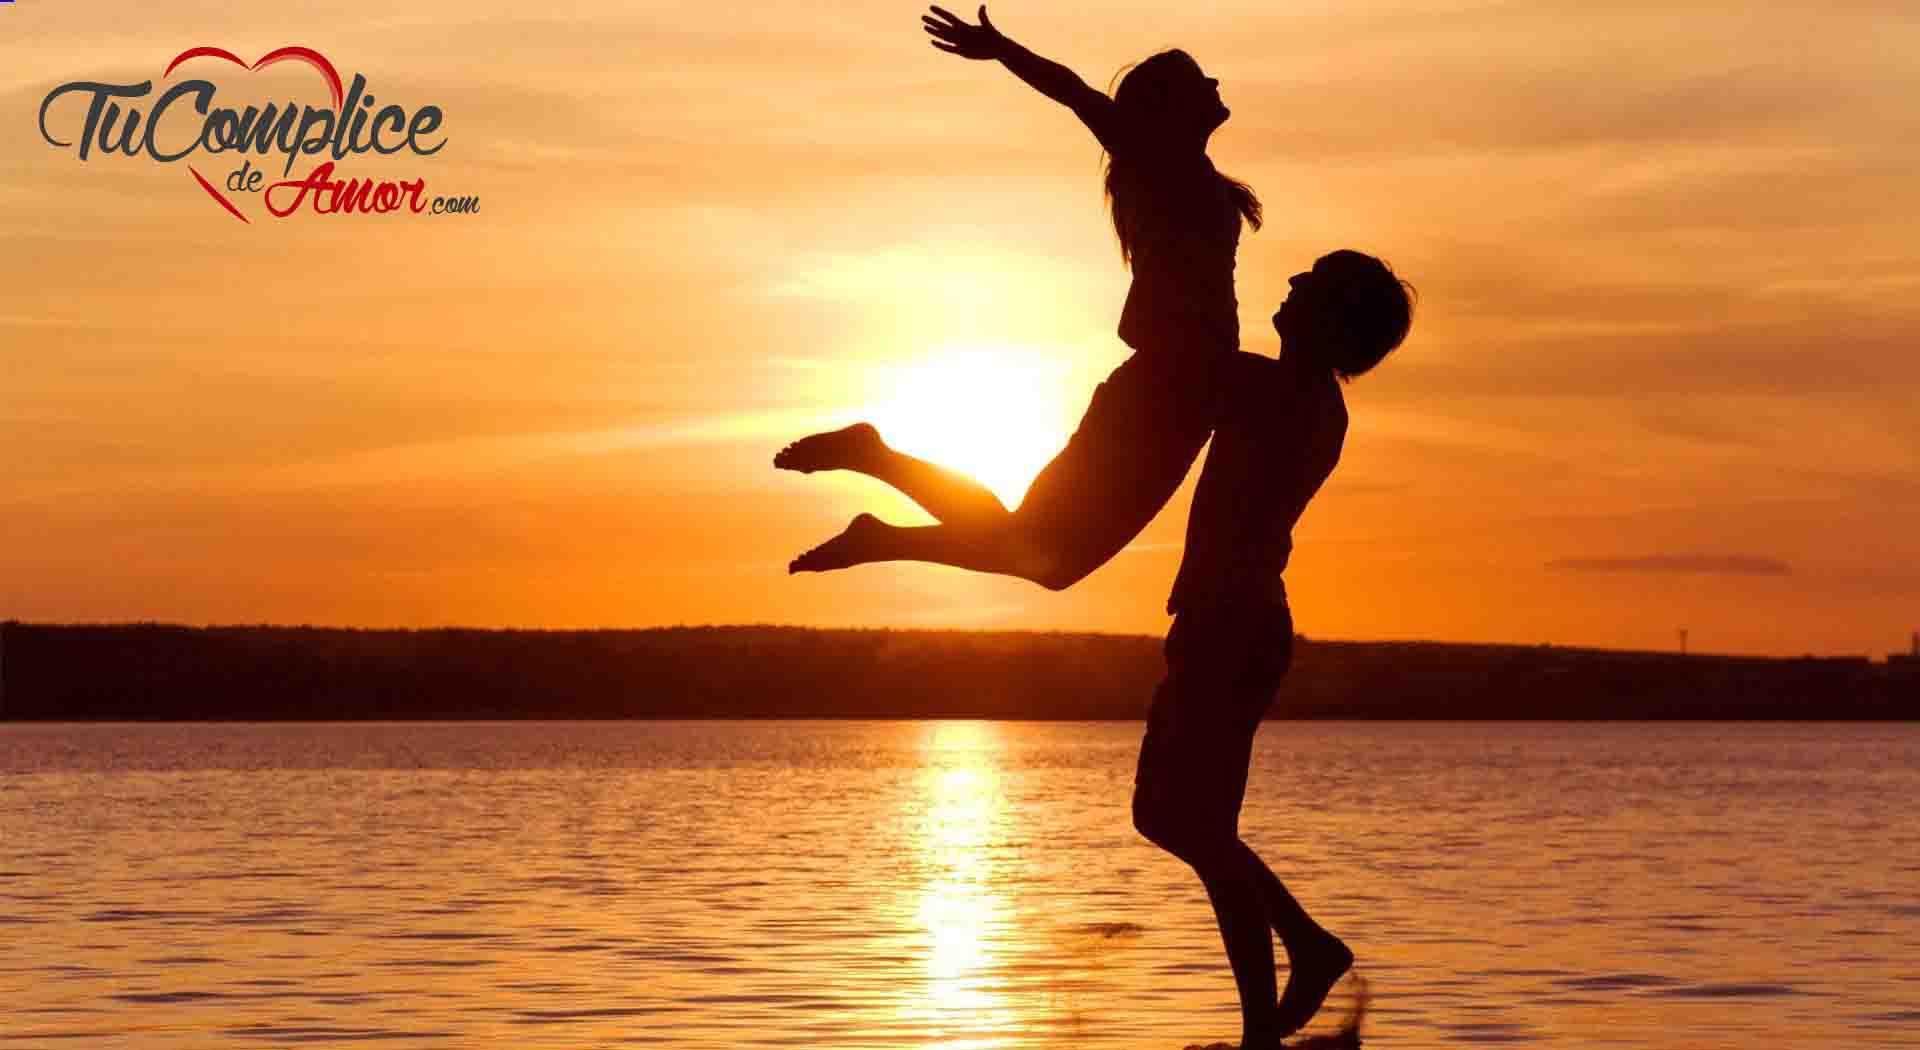 Lindas frase de amor para enamorar frases para enamorar mujer